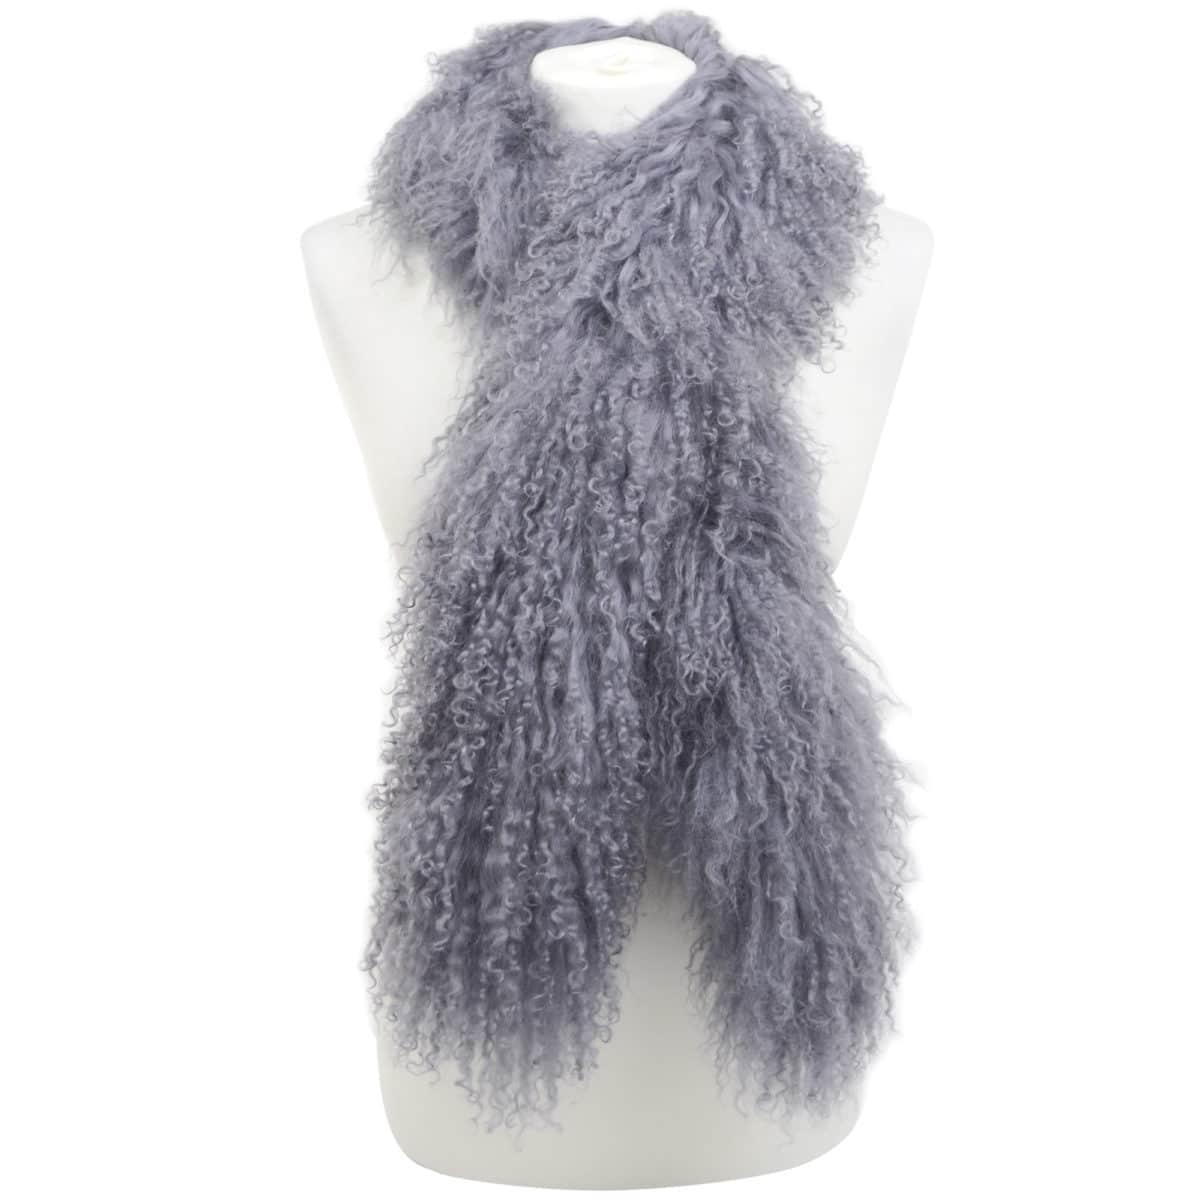 Mongolian Sheepskin Scarf - Grey